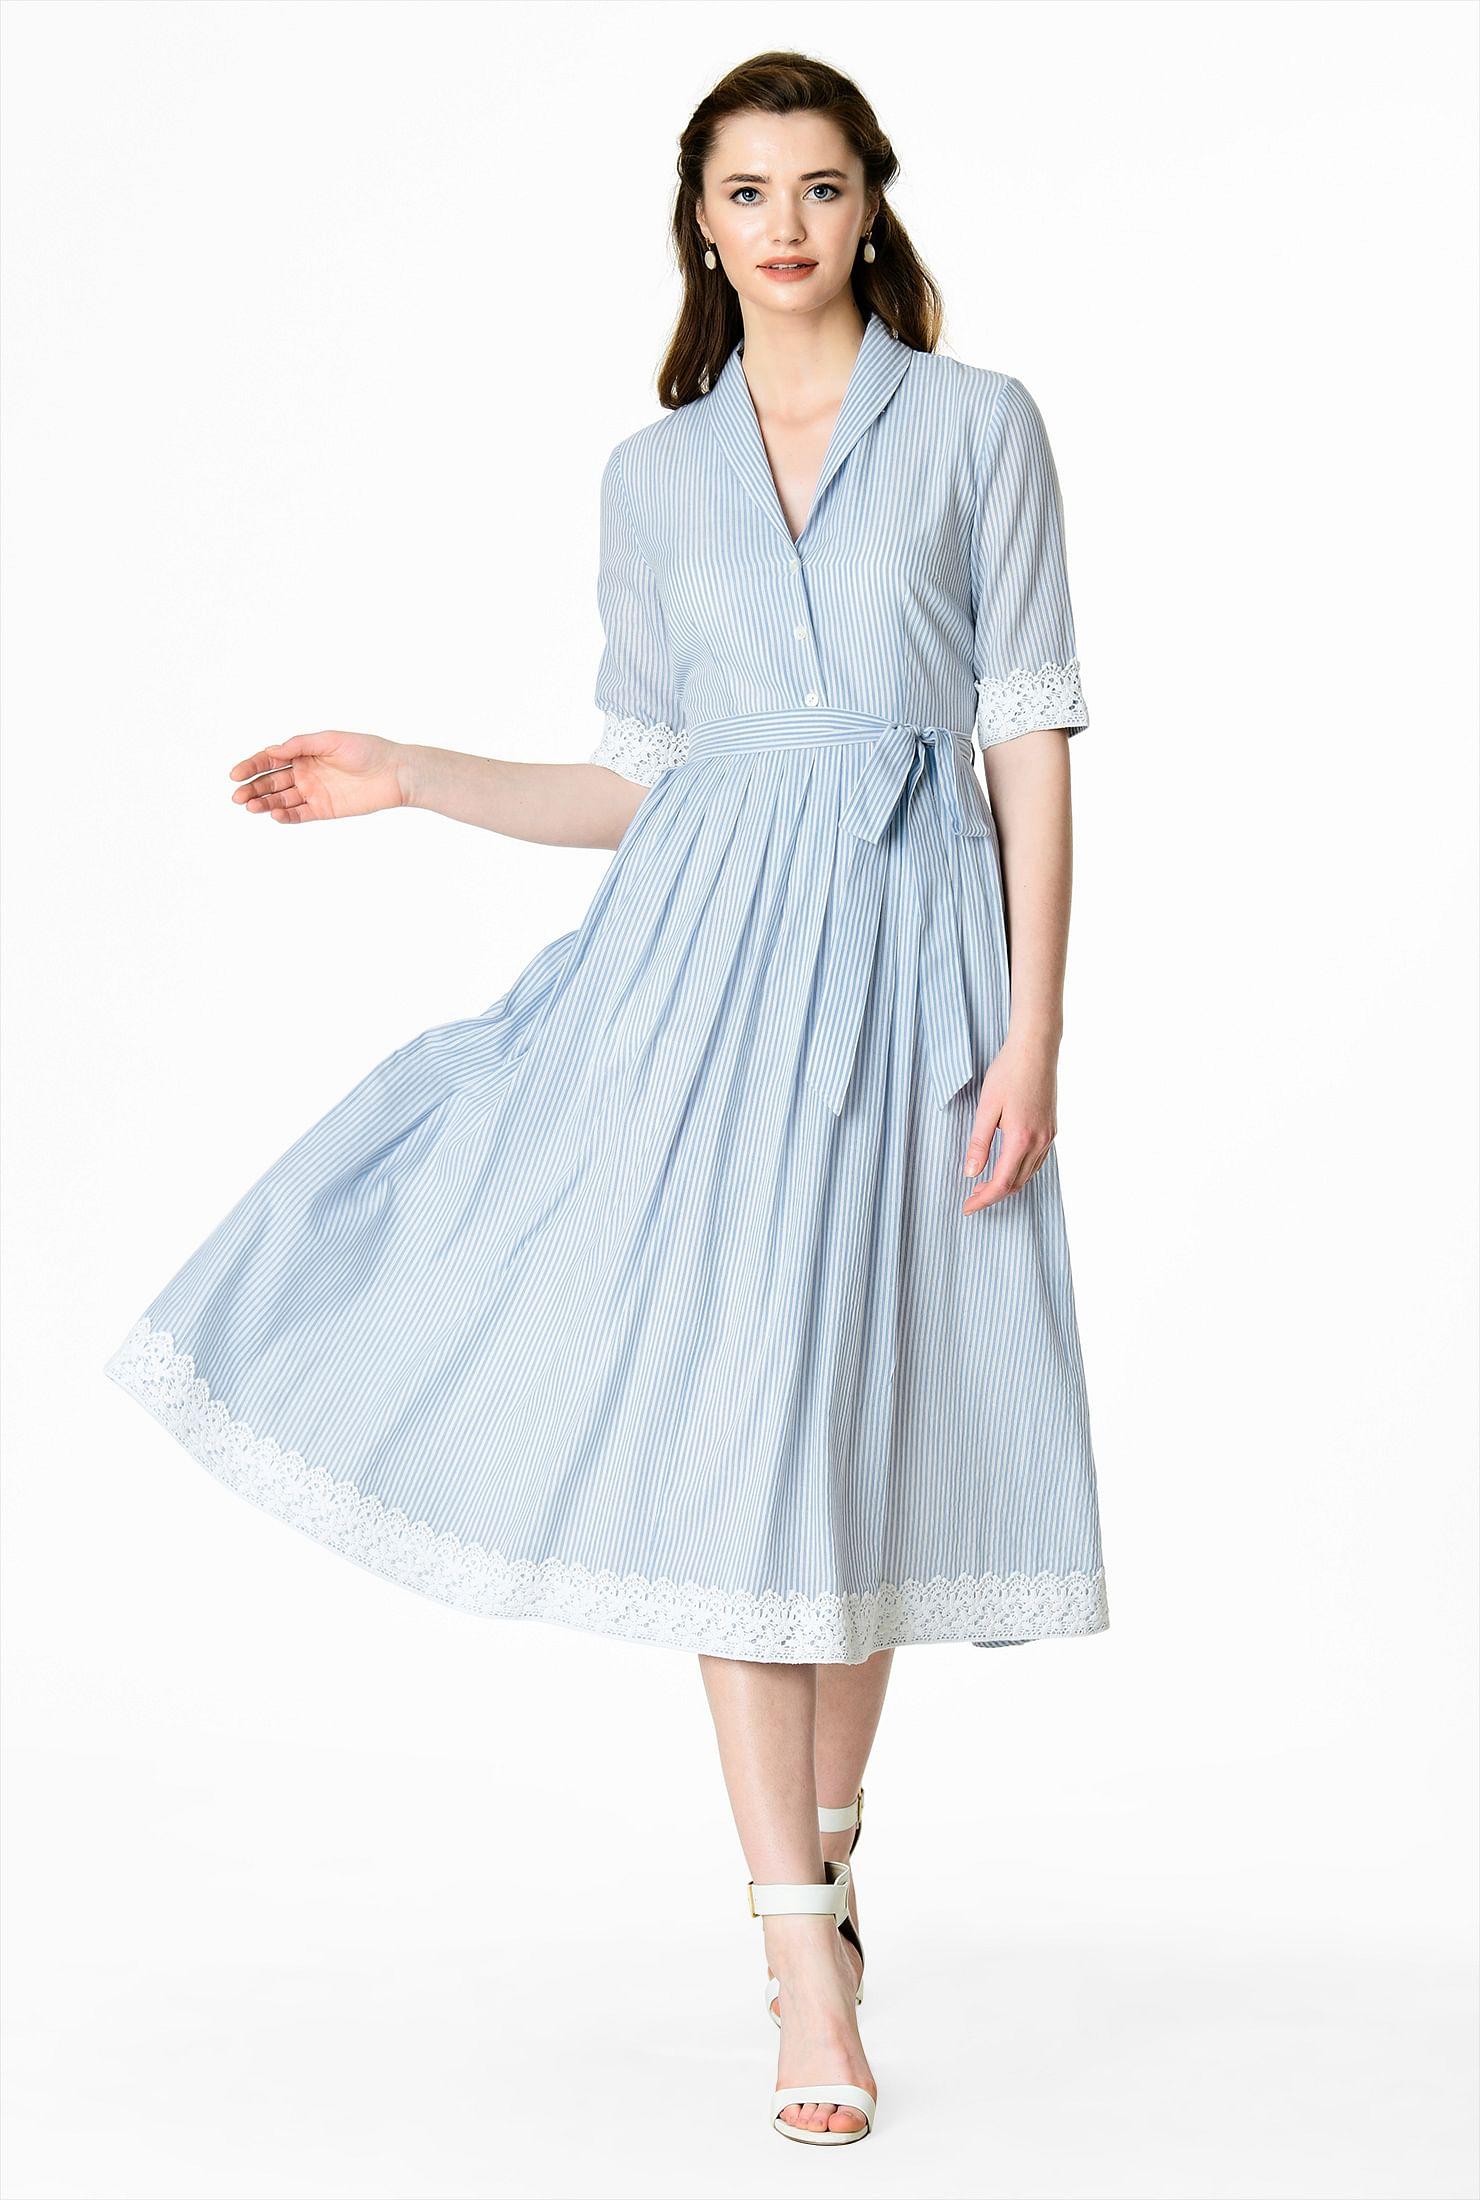 fff209c68 All size inclusive, custom size, custom style, maternity, nursing, nursing